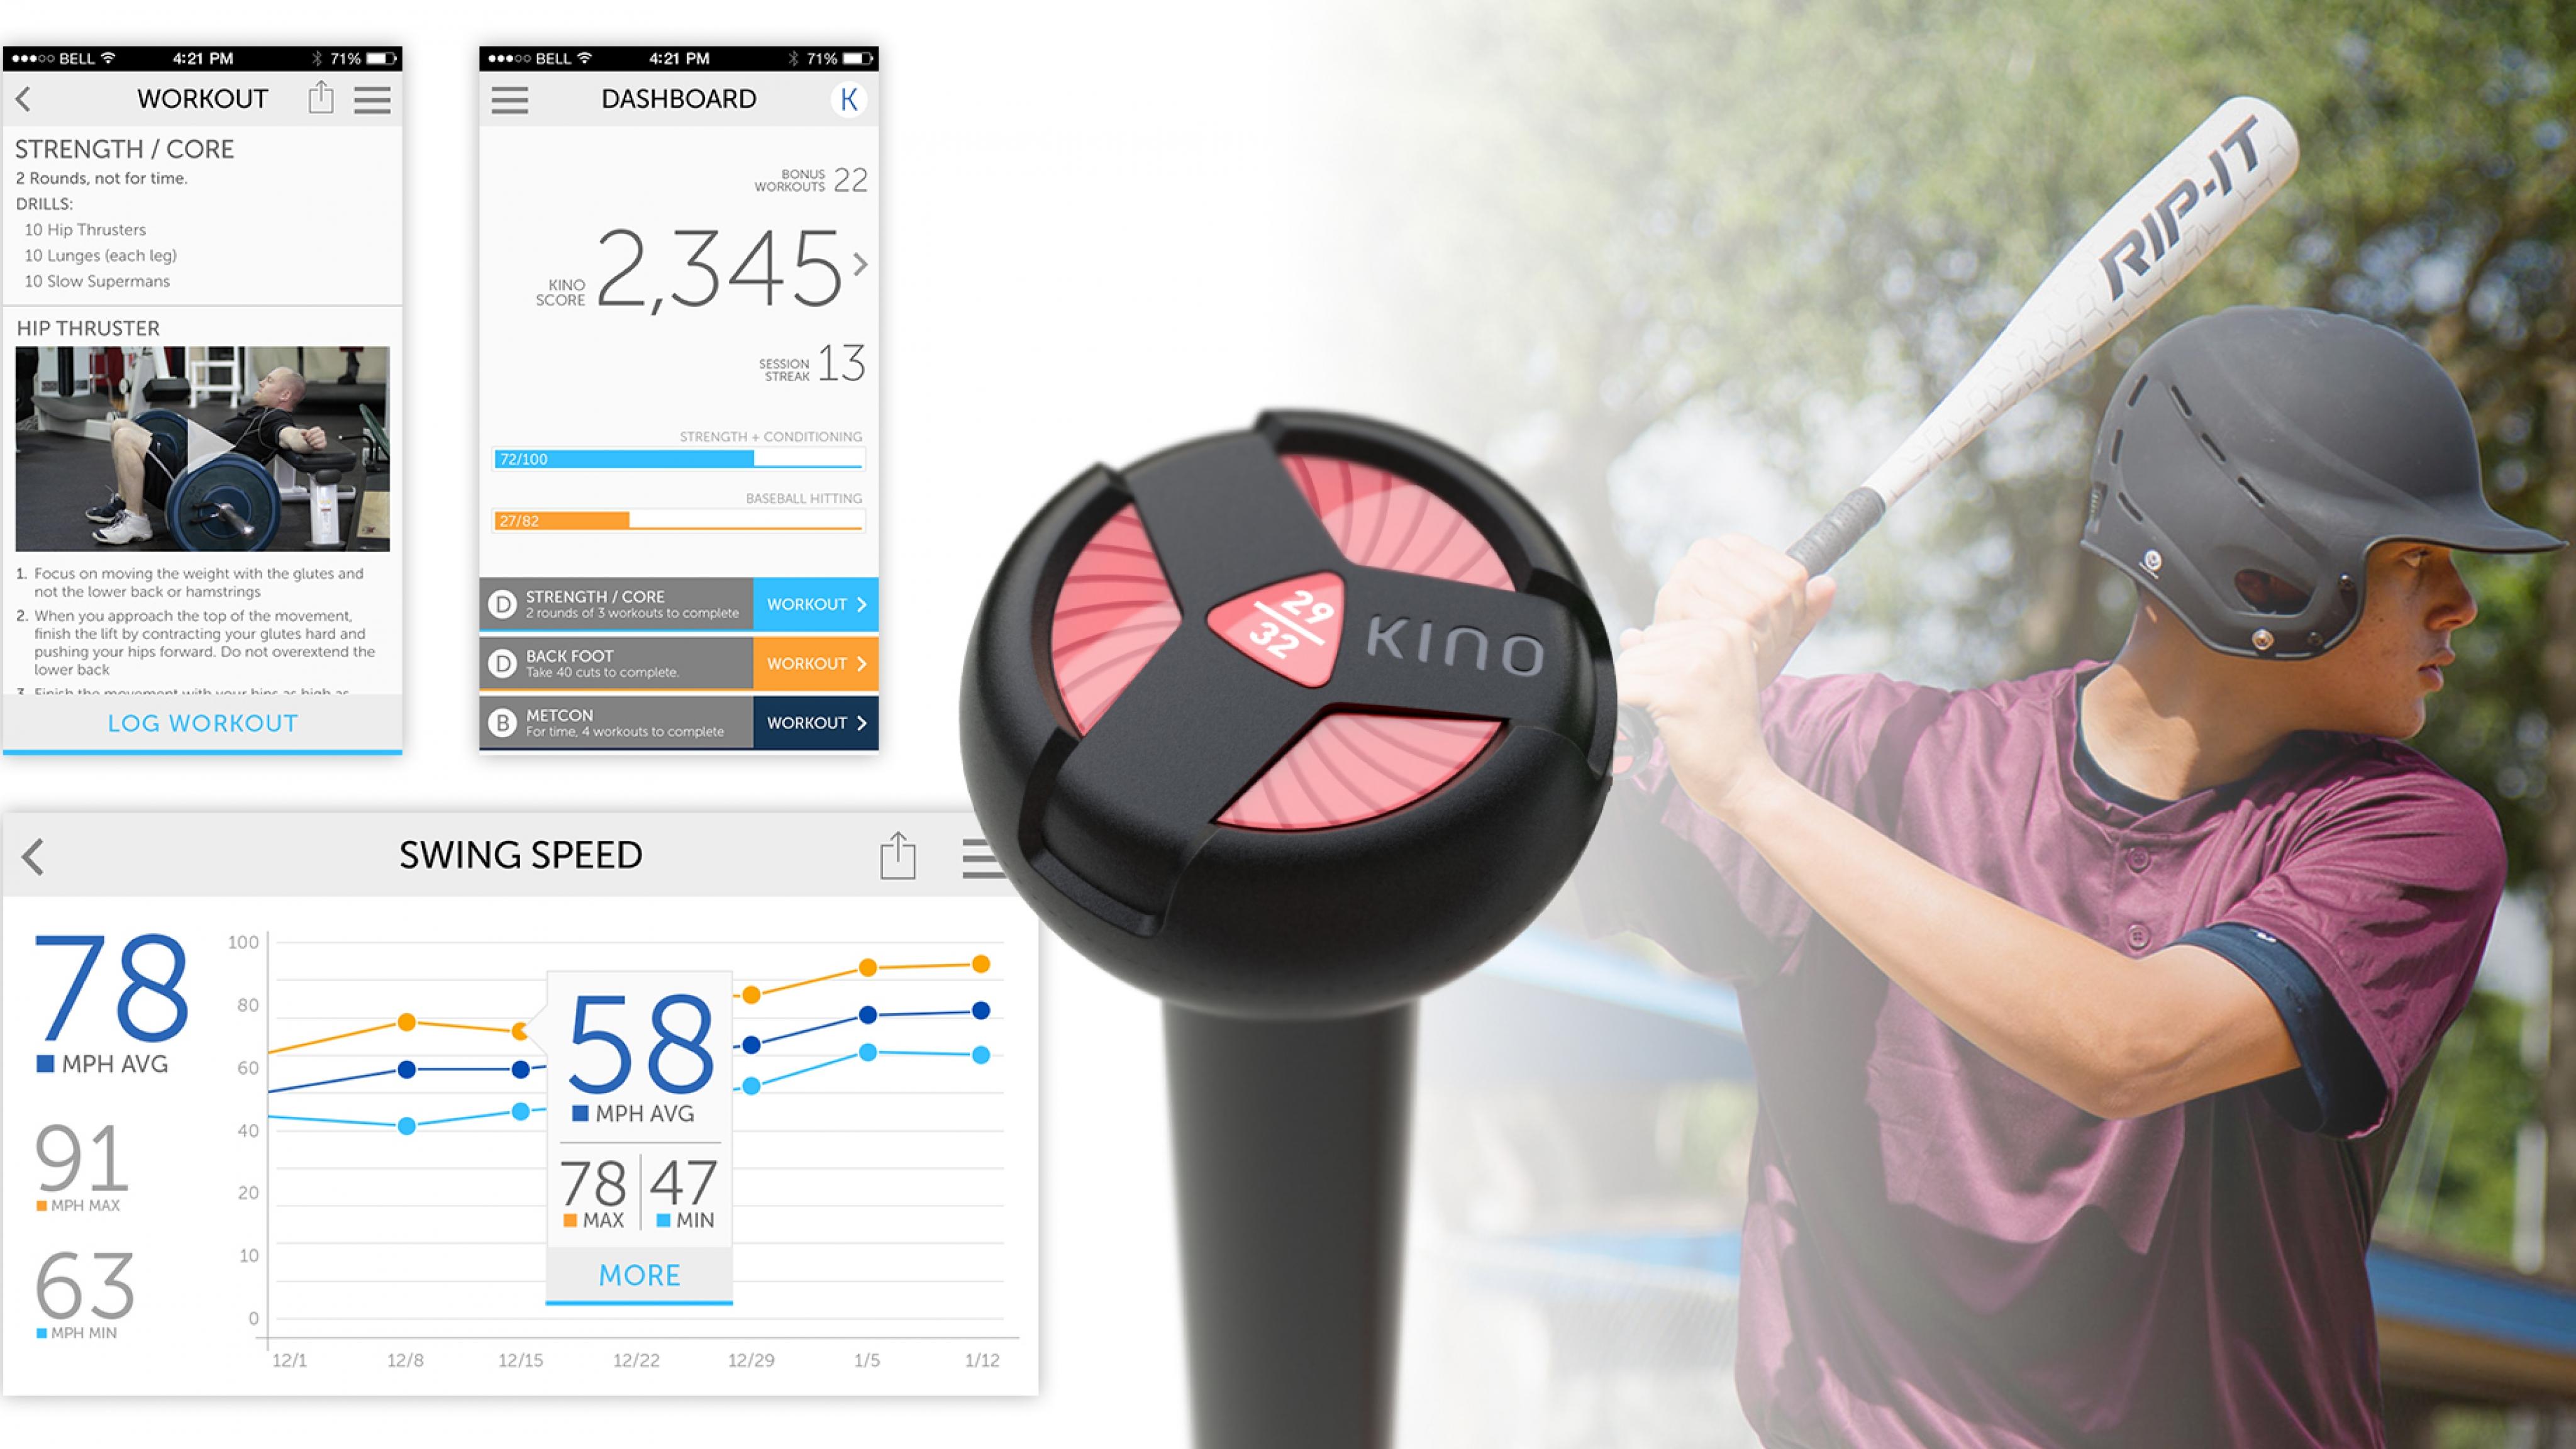 KINO Coaching App and RIP-IT Smart Bat   ROBRADY design